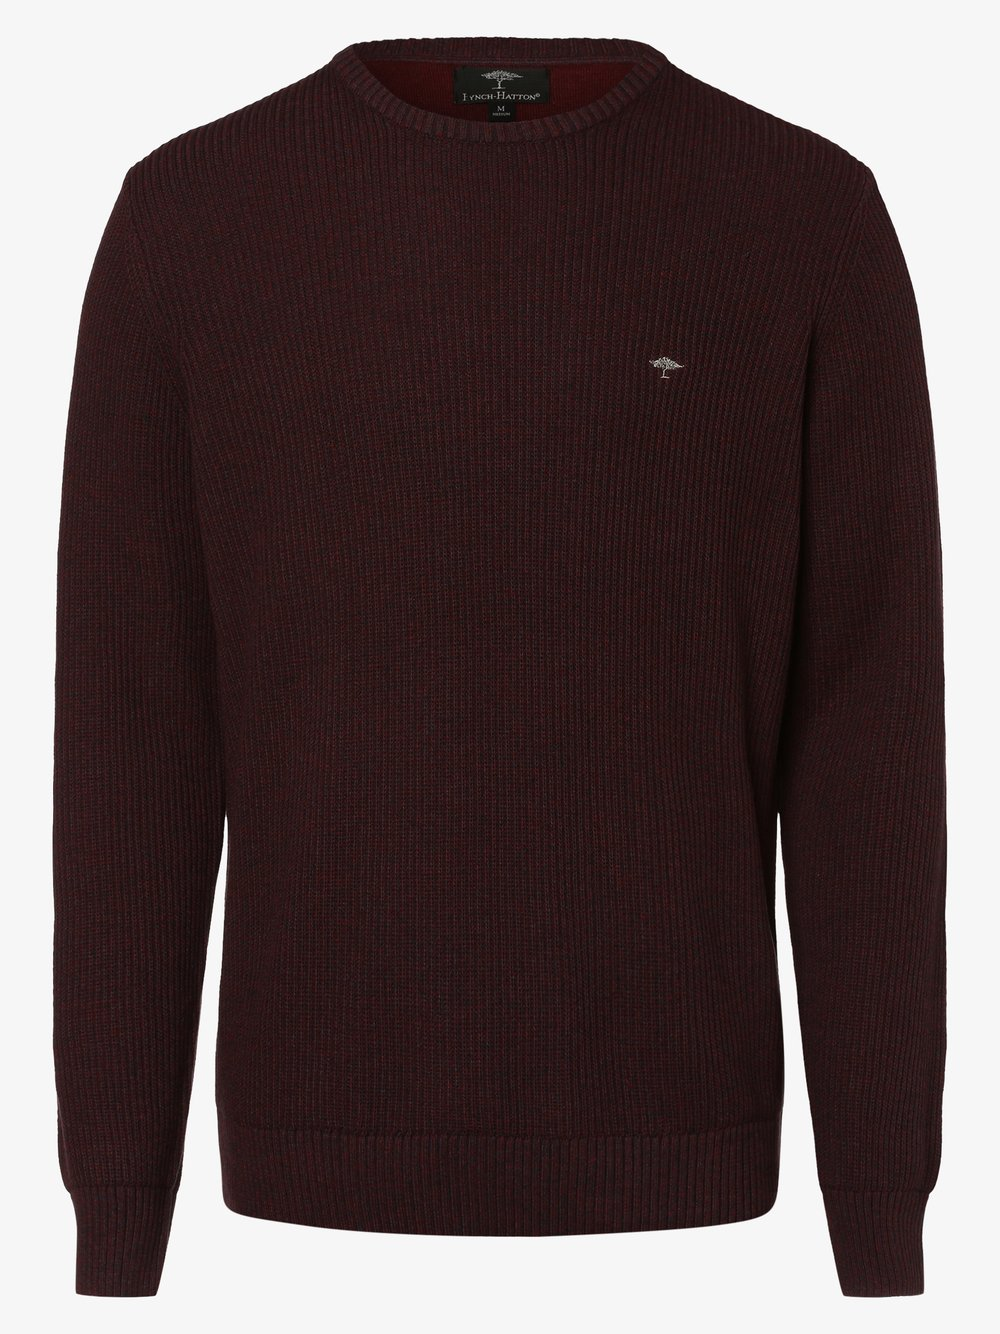 Fynch-Hatton – Sweter męski, czerwony Van Graaf 447155-0001